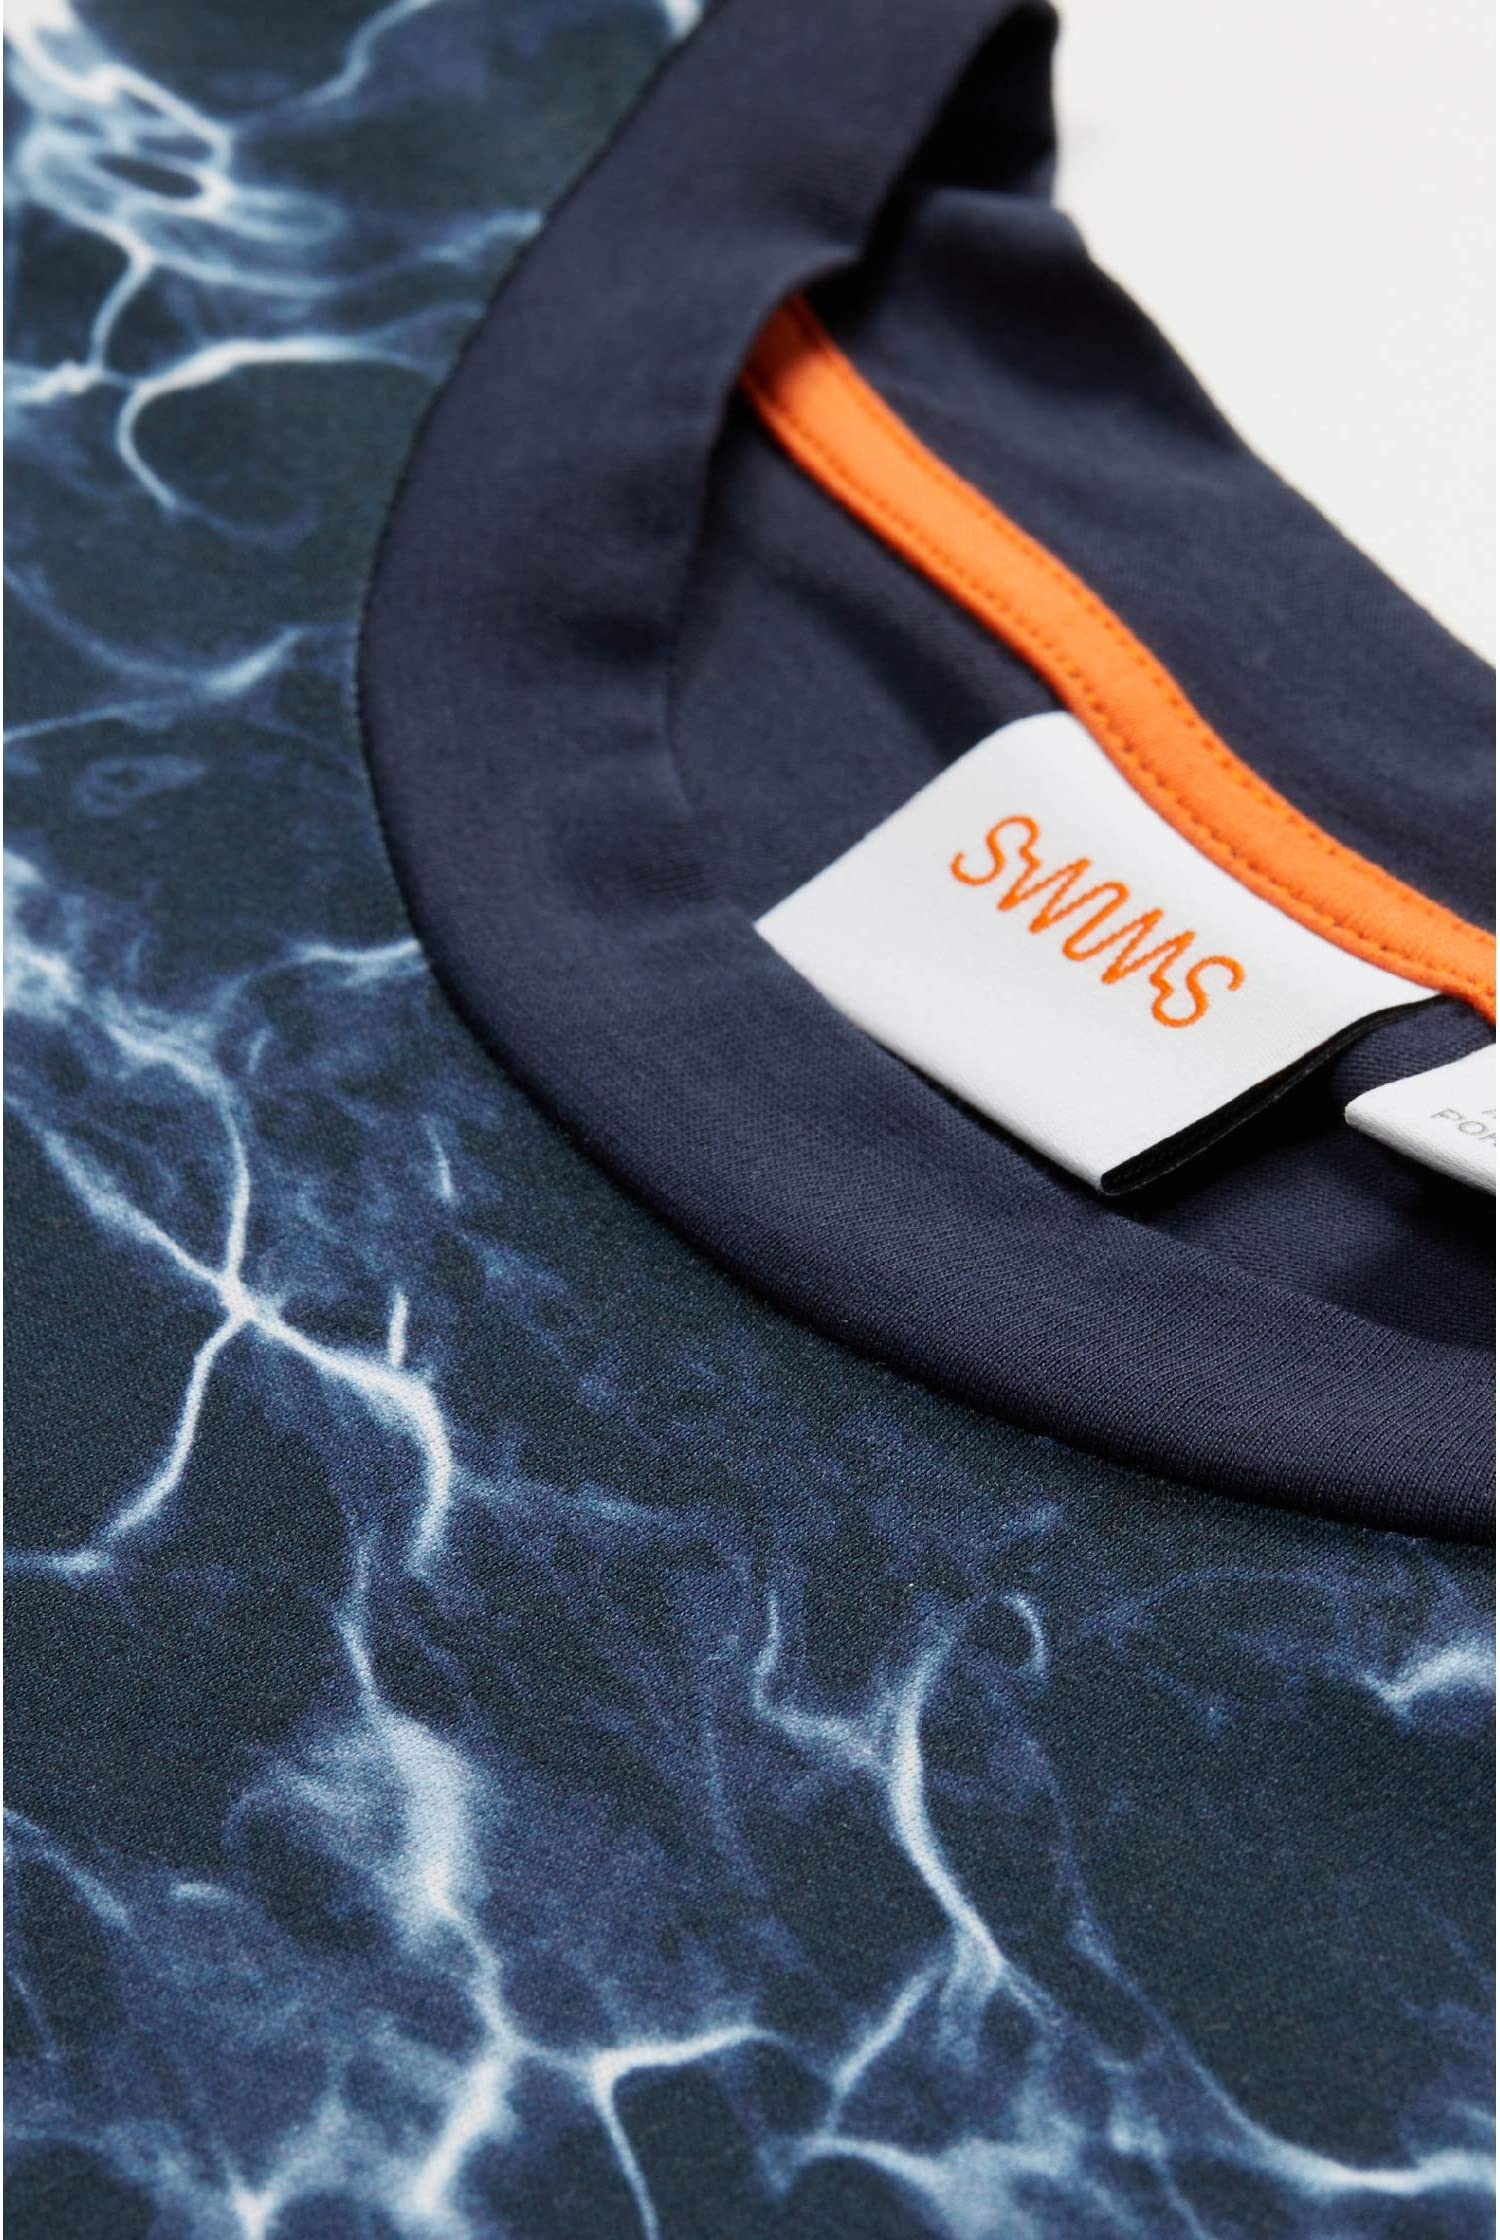 SWIMS Breeze Oahu Pool Print T-Shirt 7Kp1Q